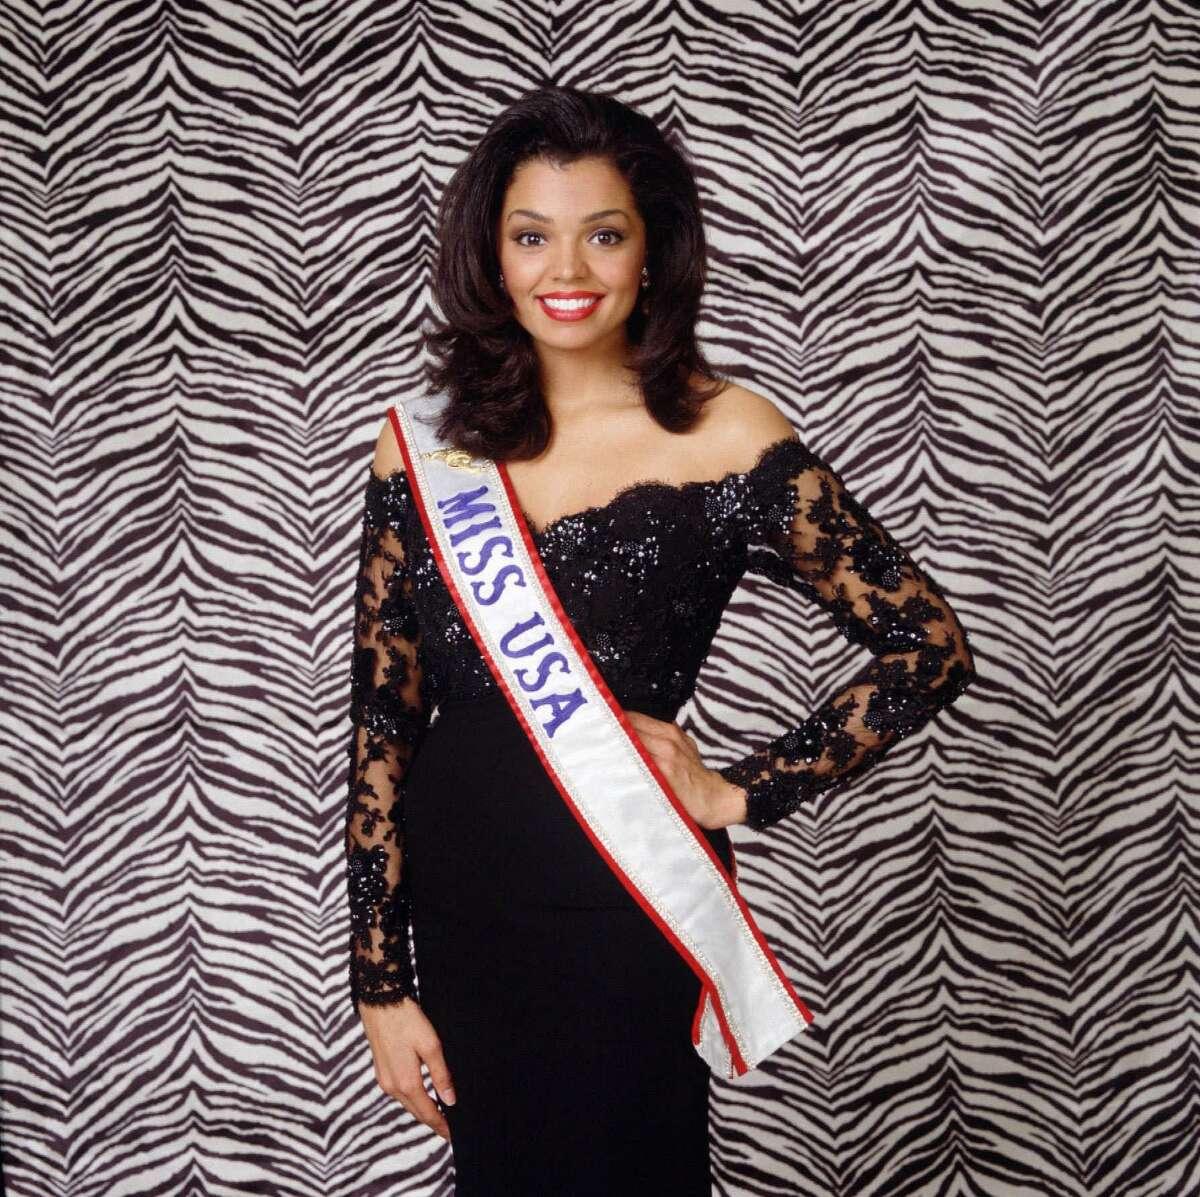 Chelsi Smith, Miss USA 1995.